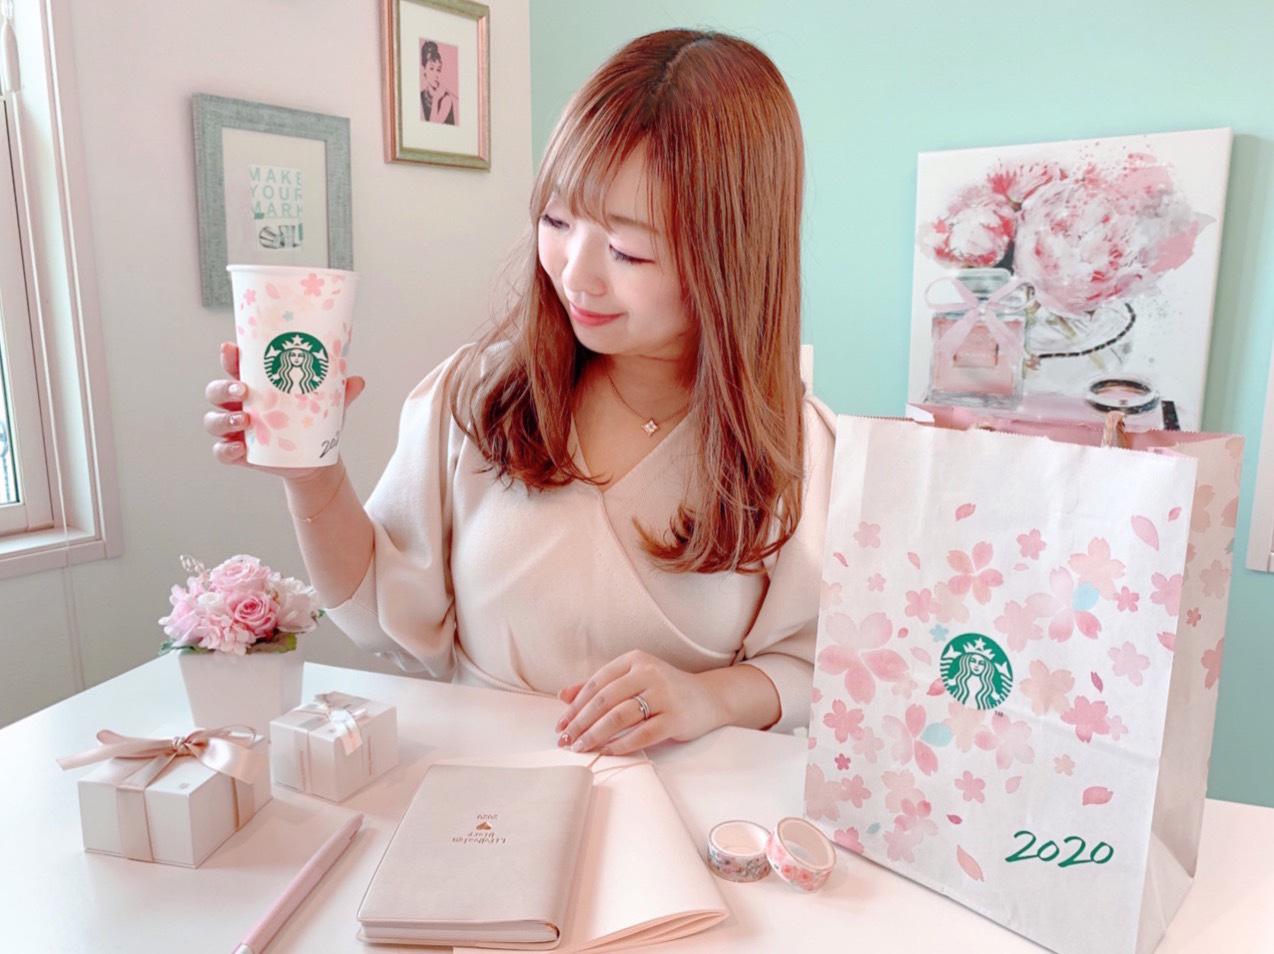 https://image.reservestock.jp/pictures/12323_ZDc3ZWU3YmEyNWUyM.jpg